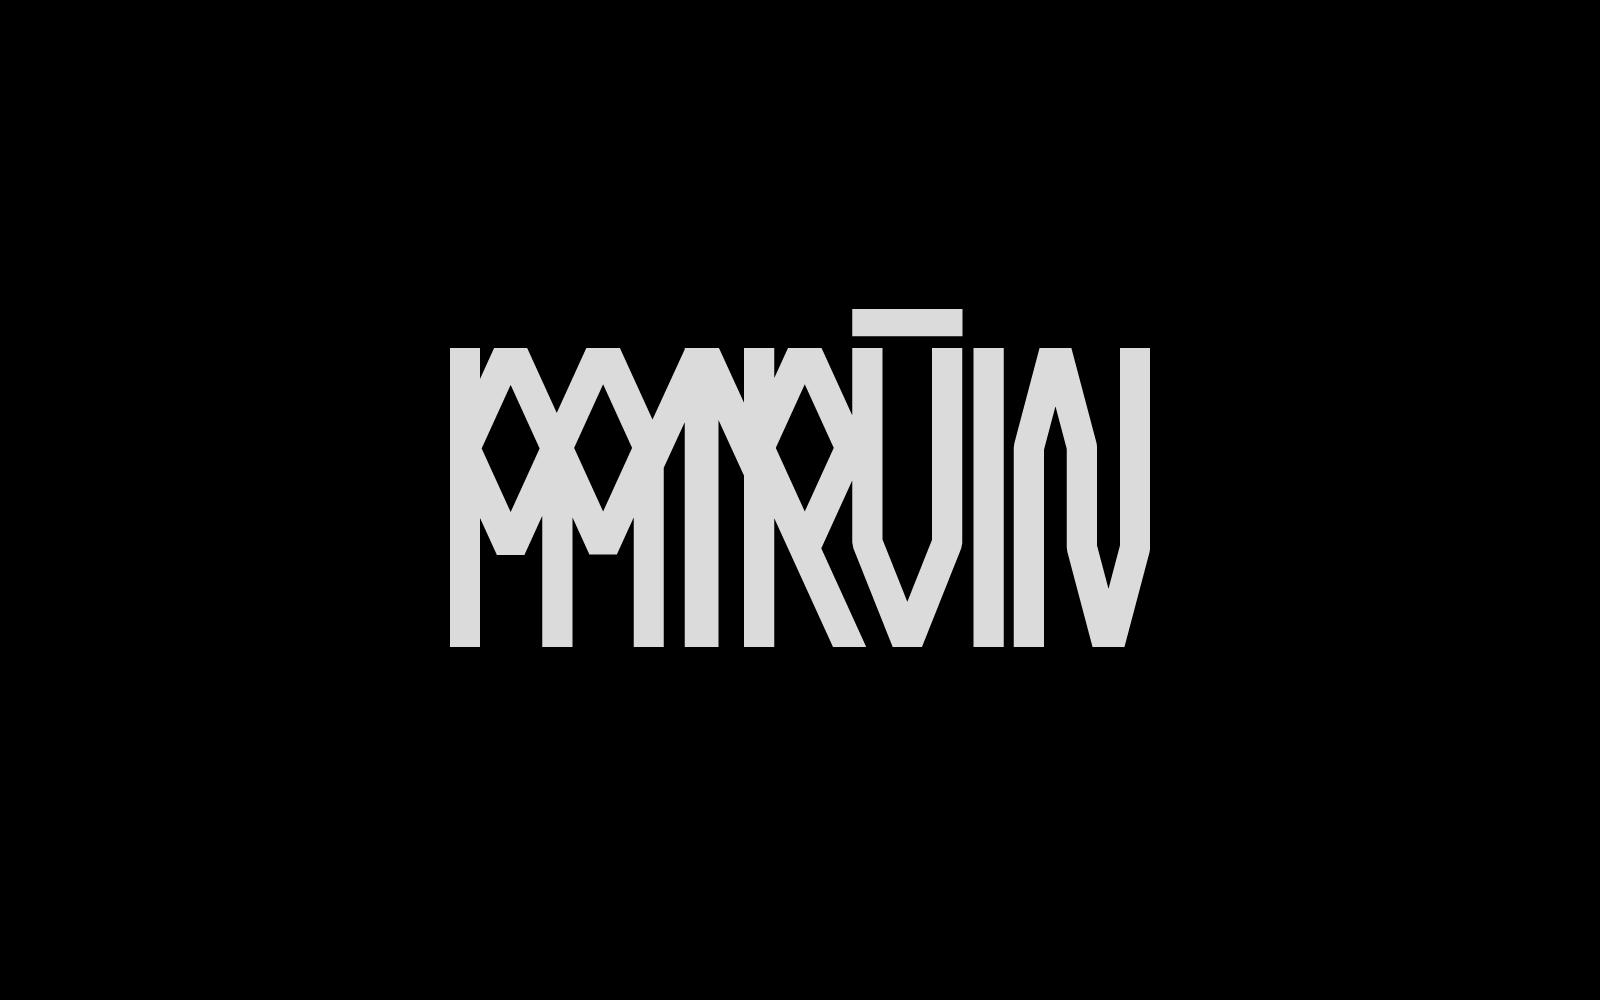 Cover image: Patrúin